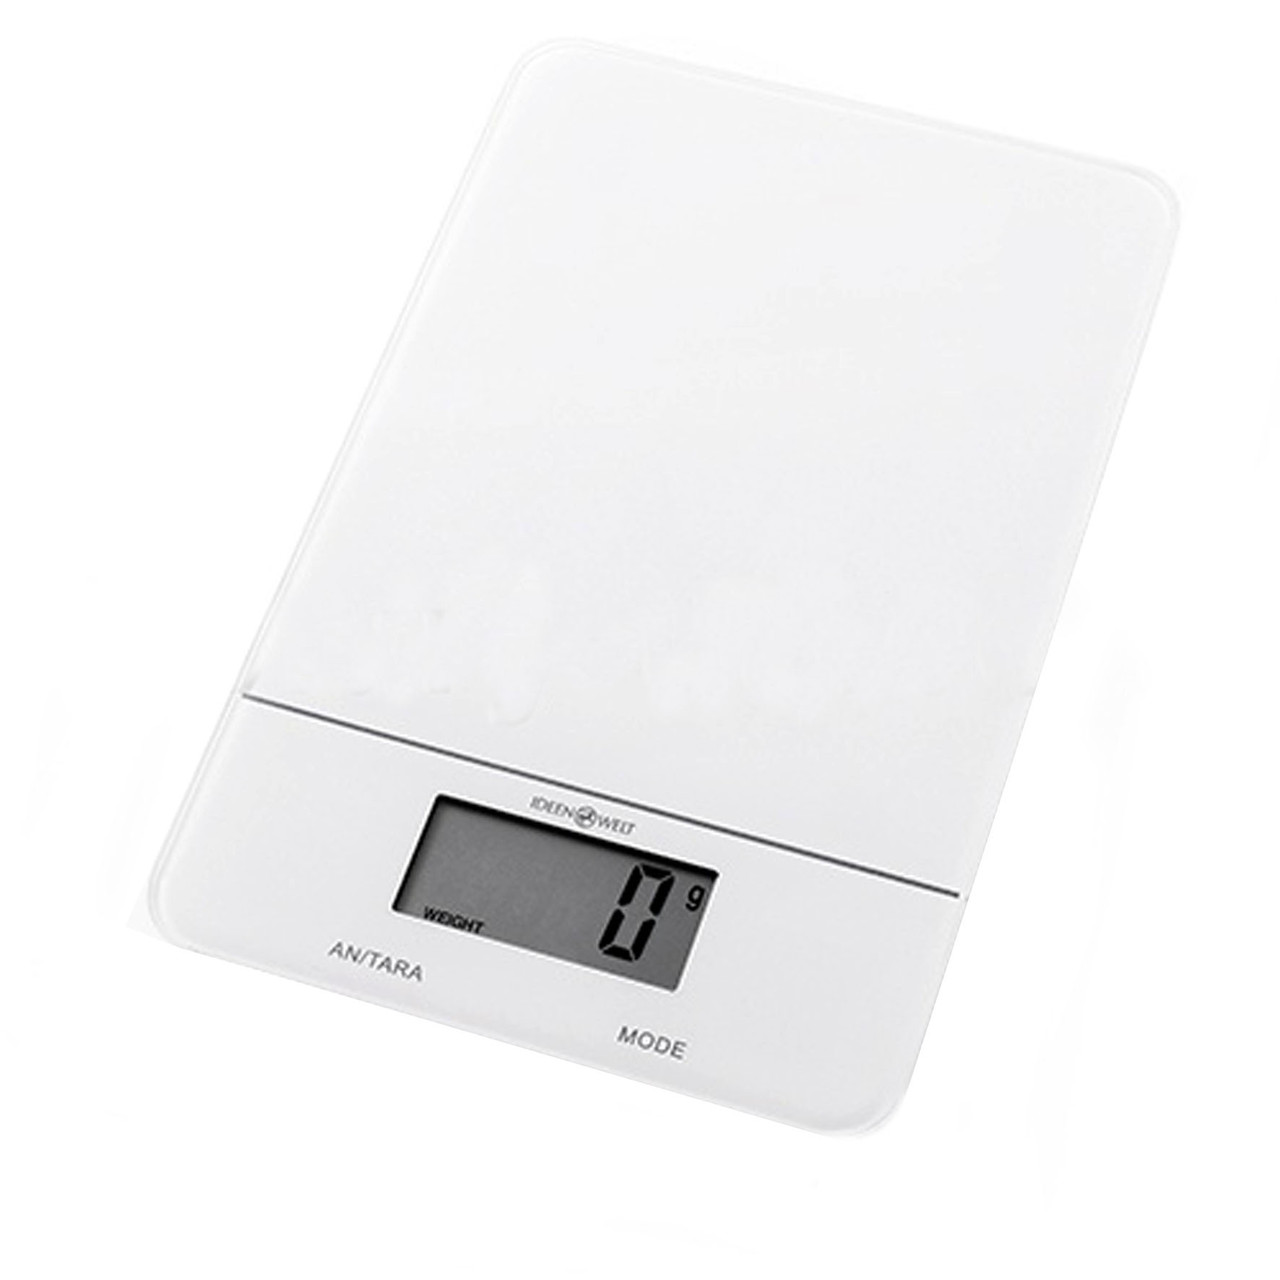 Весы кухонные электронные CFC2021, 5кг 1г (электронные весы)